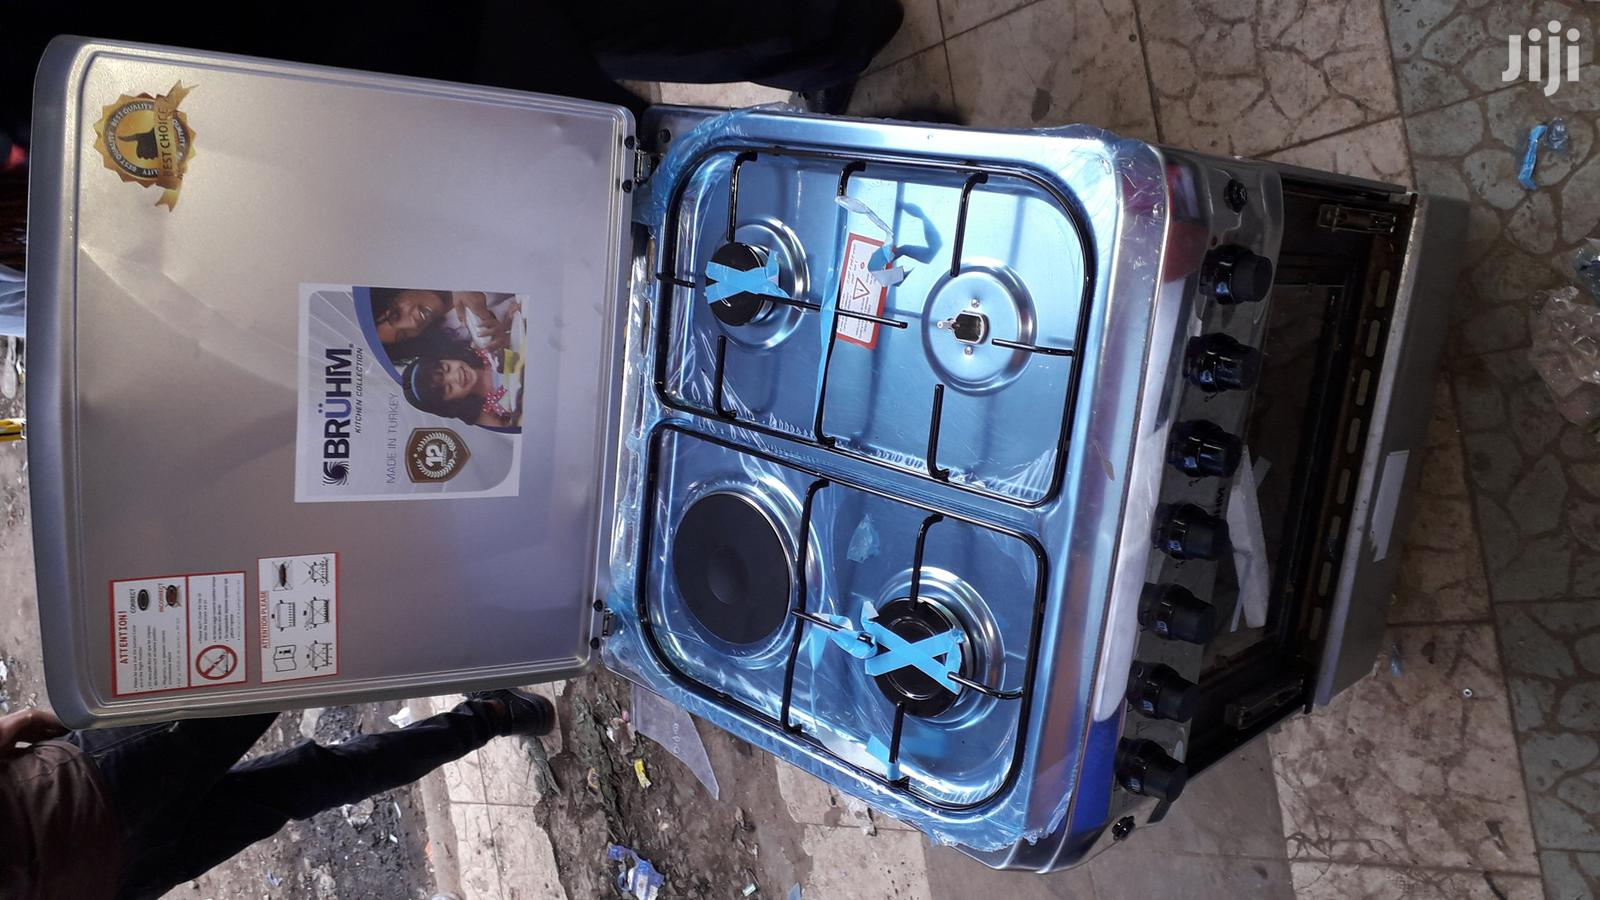 Gas Cooker 4 Burner | Kitchen Appliances for sale in Nairobi Central, Nairobi, Kenya